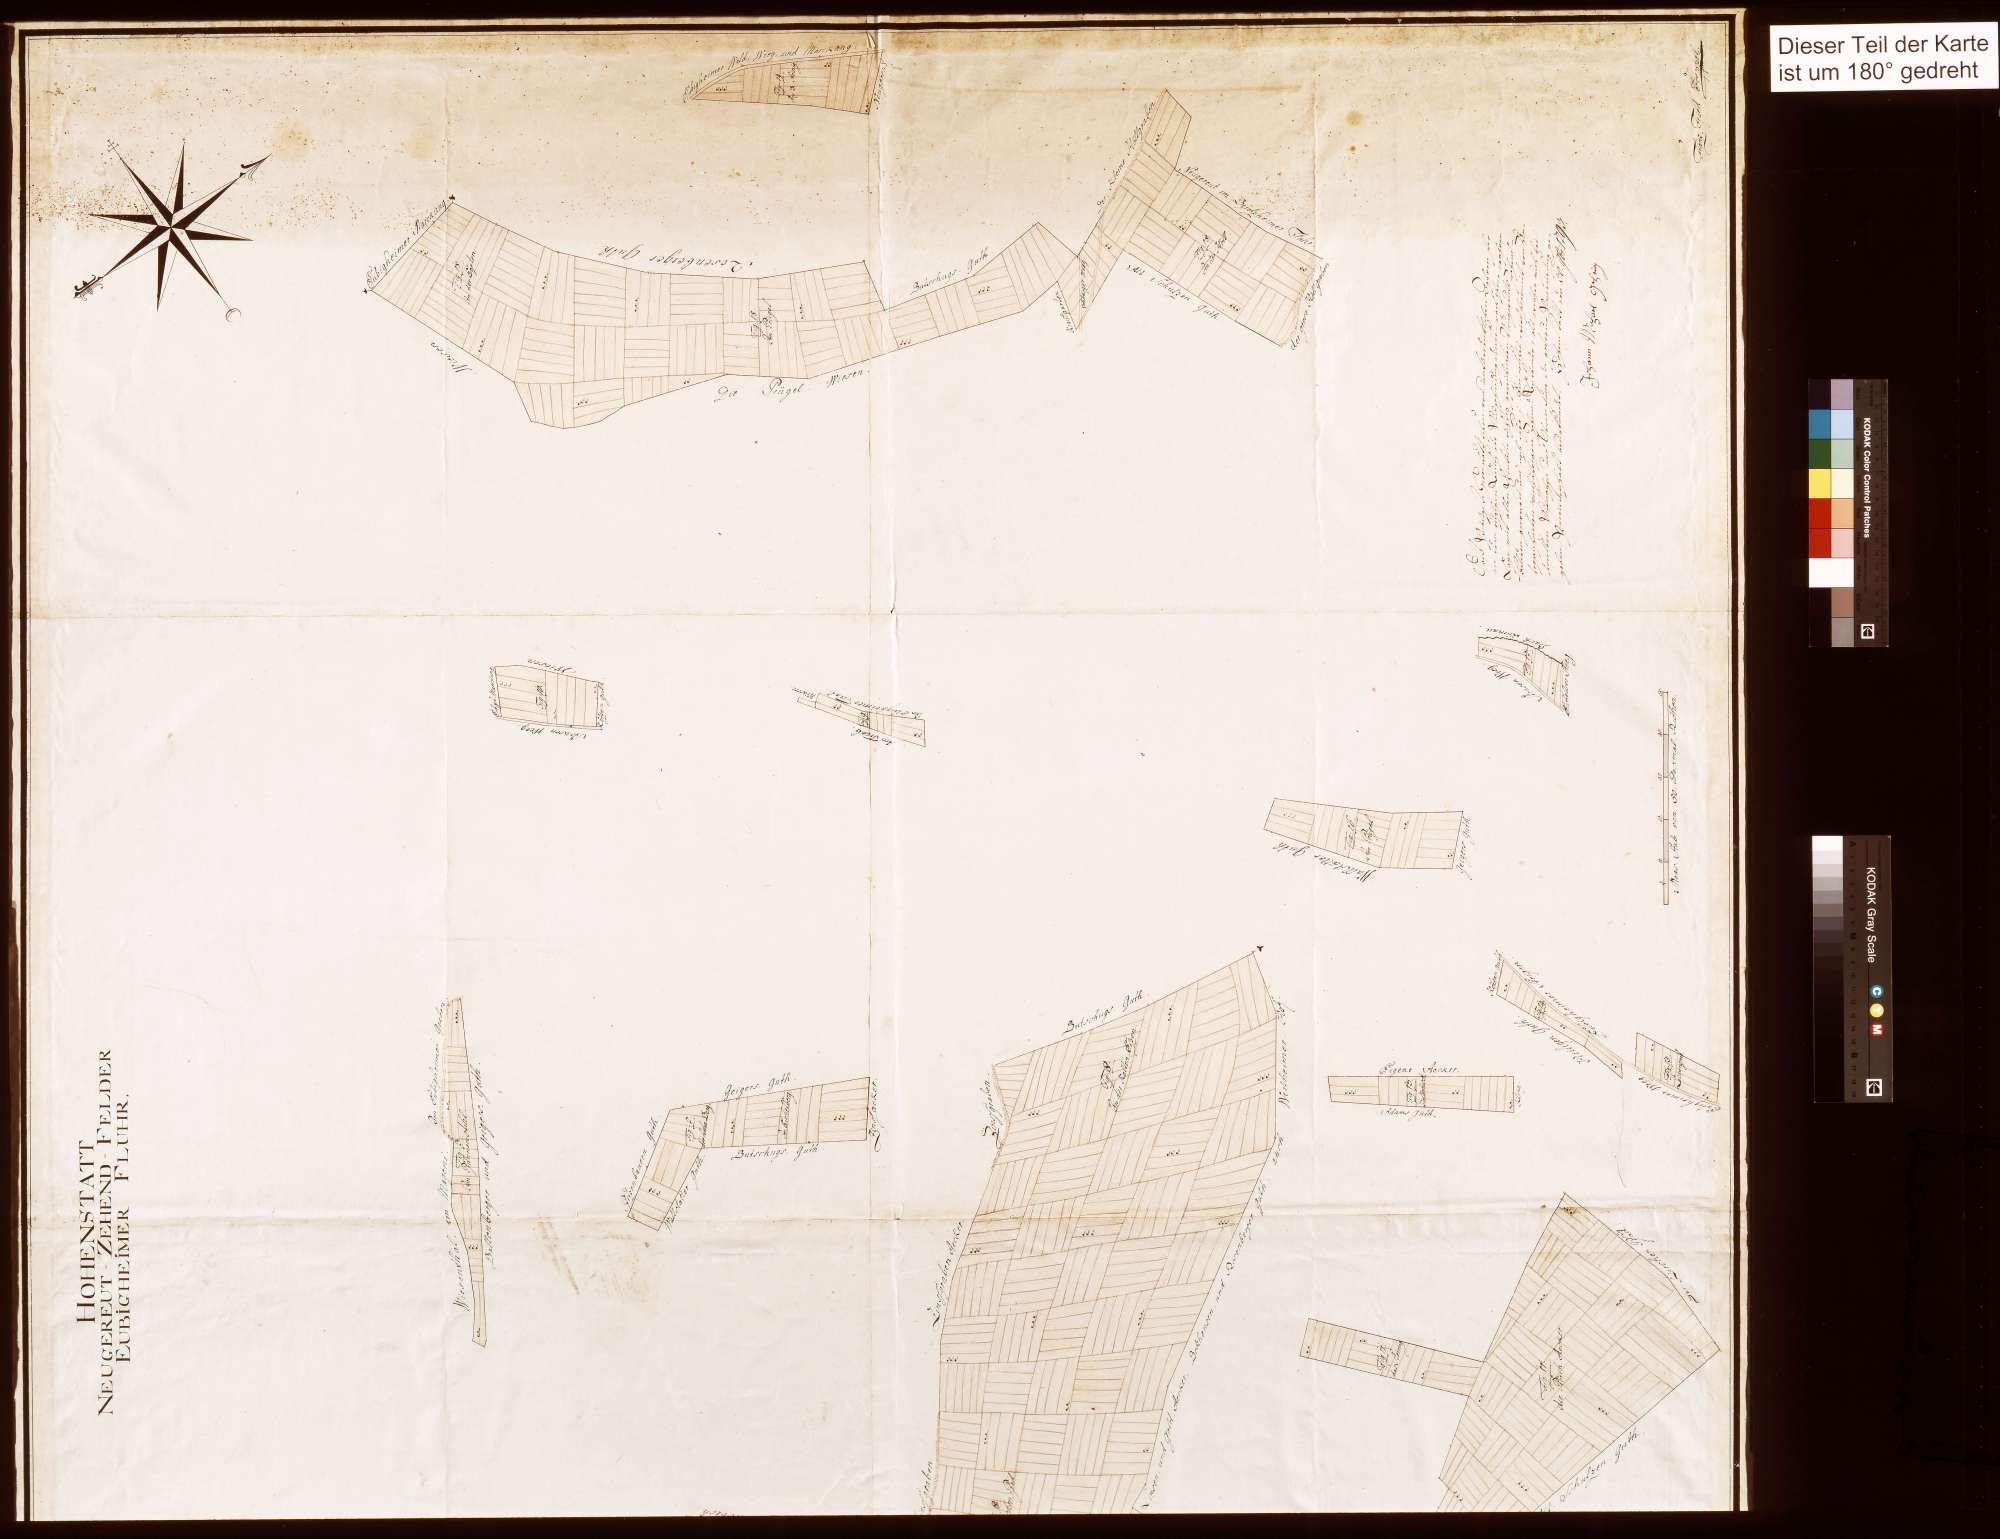 Hohenstadt: Neugereutzehntfelder, Eubigheimer Flur (Inselkarte), Bild 2